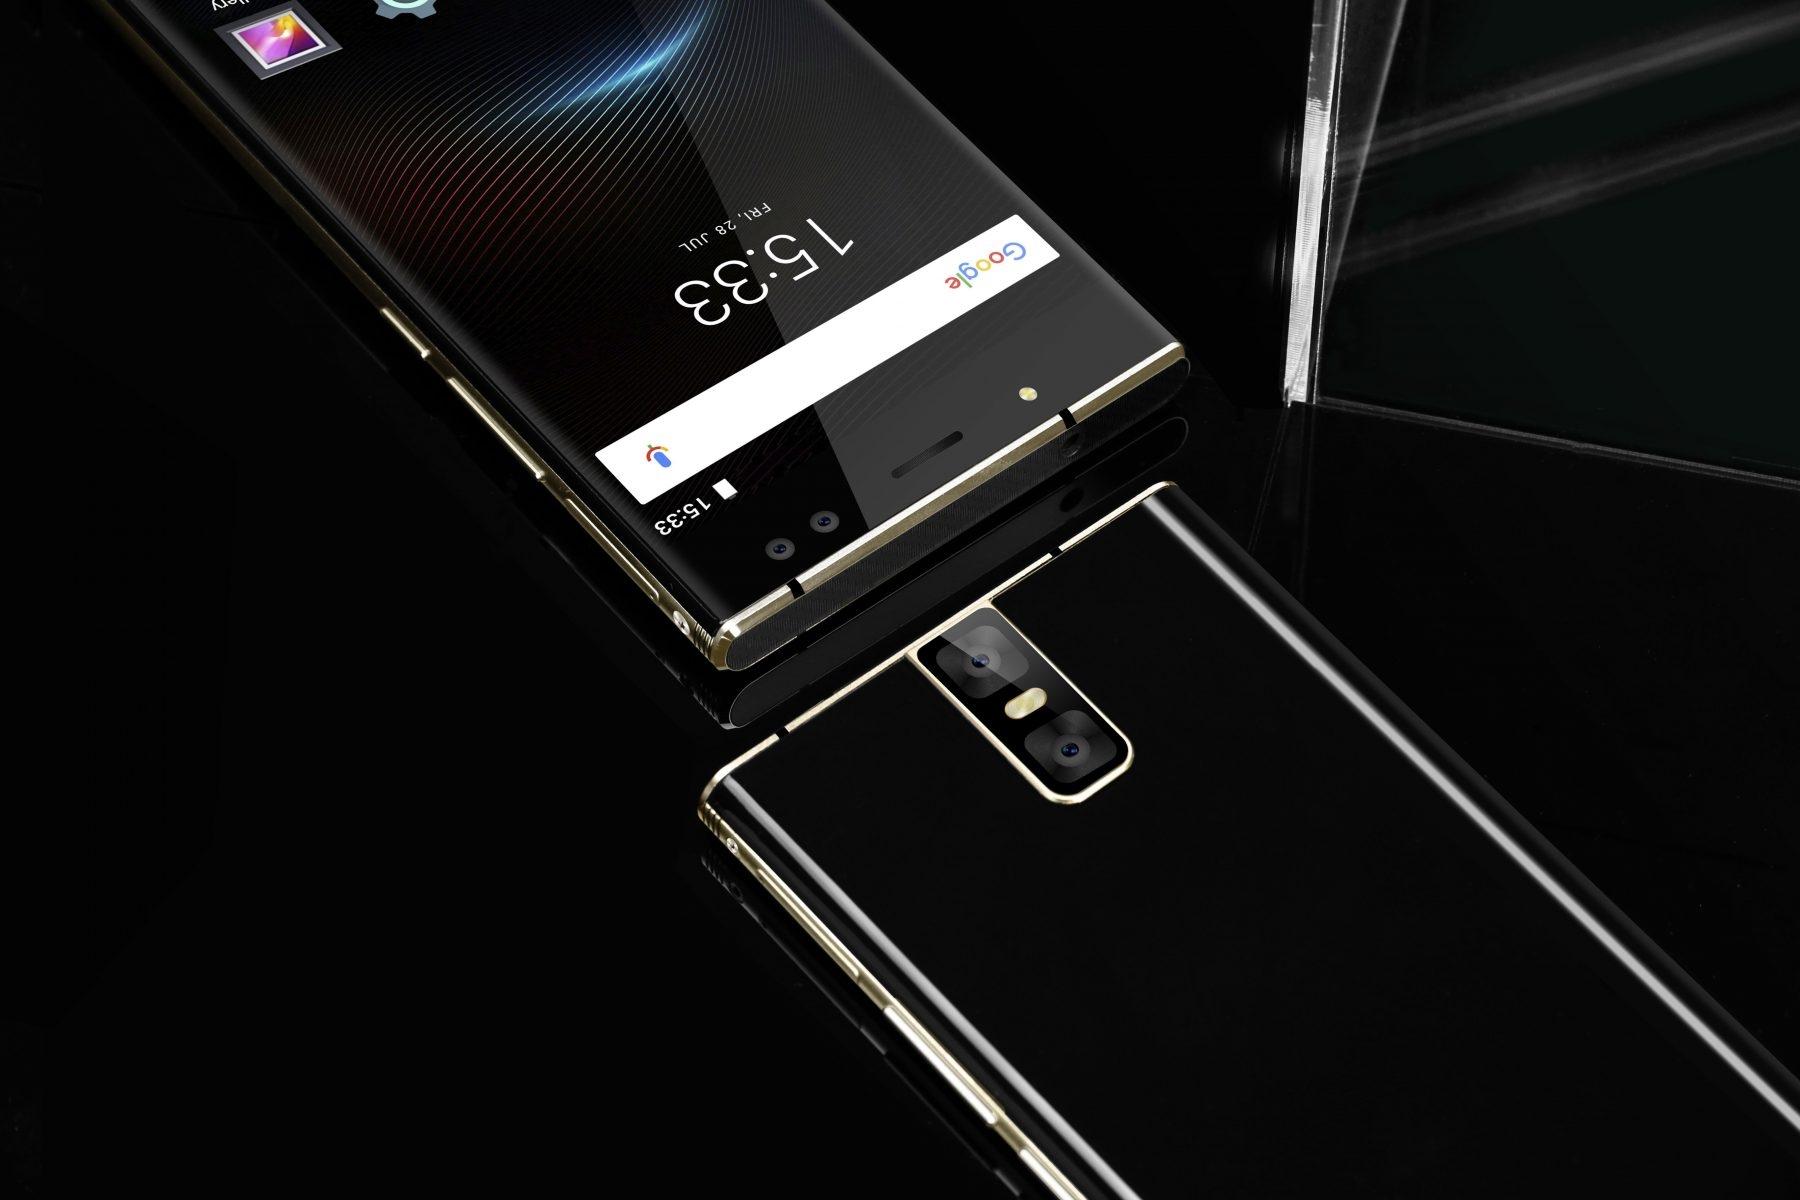 OUKITEL K3 to Impress with Sony Xperia XZ Design and Four Cameras | DeviceDaily.com